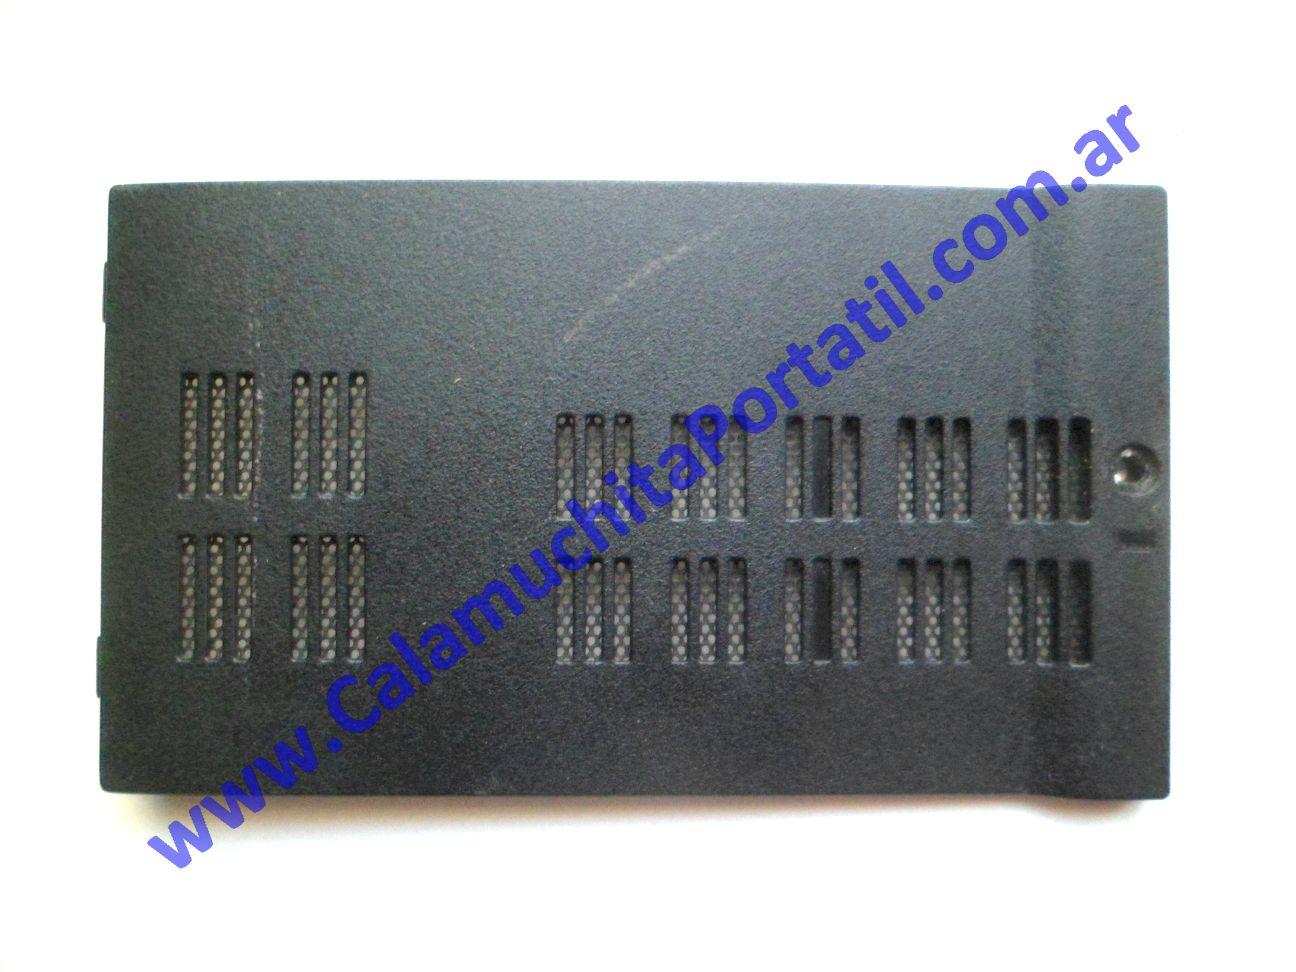 0581CTM Carcasas Tapa Memoria Acer Aspire 5517-1127 / KAWG0